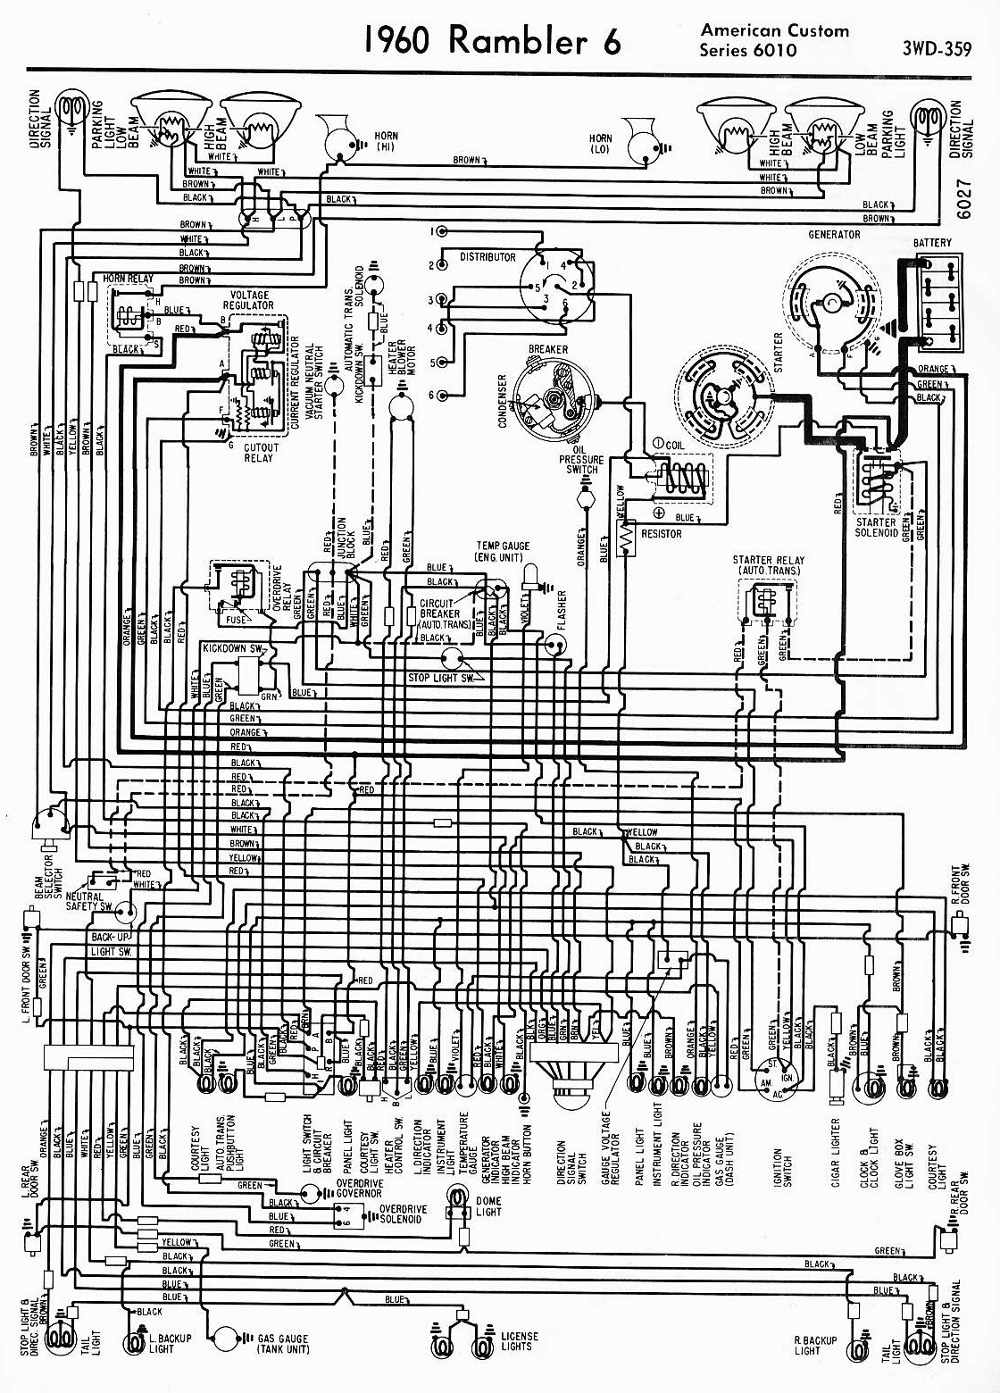 amc car manuals wiring diagrams pdf fault codes rh automotive manuals net 1967 Ford F100 Wiring Diagram 1967 VW Wiring Diagram